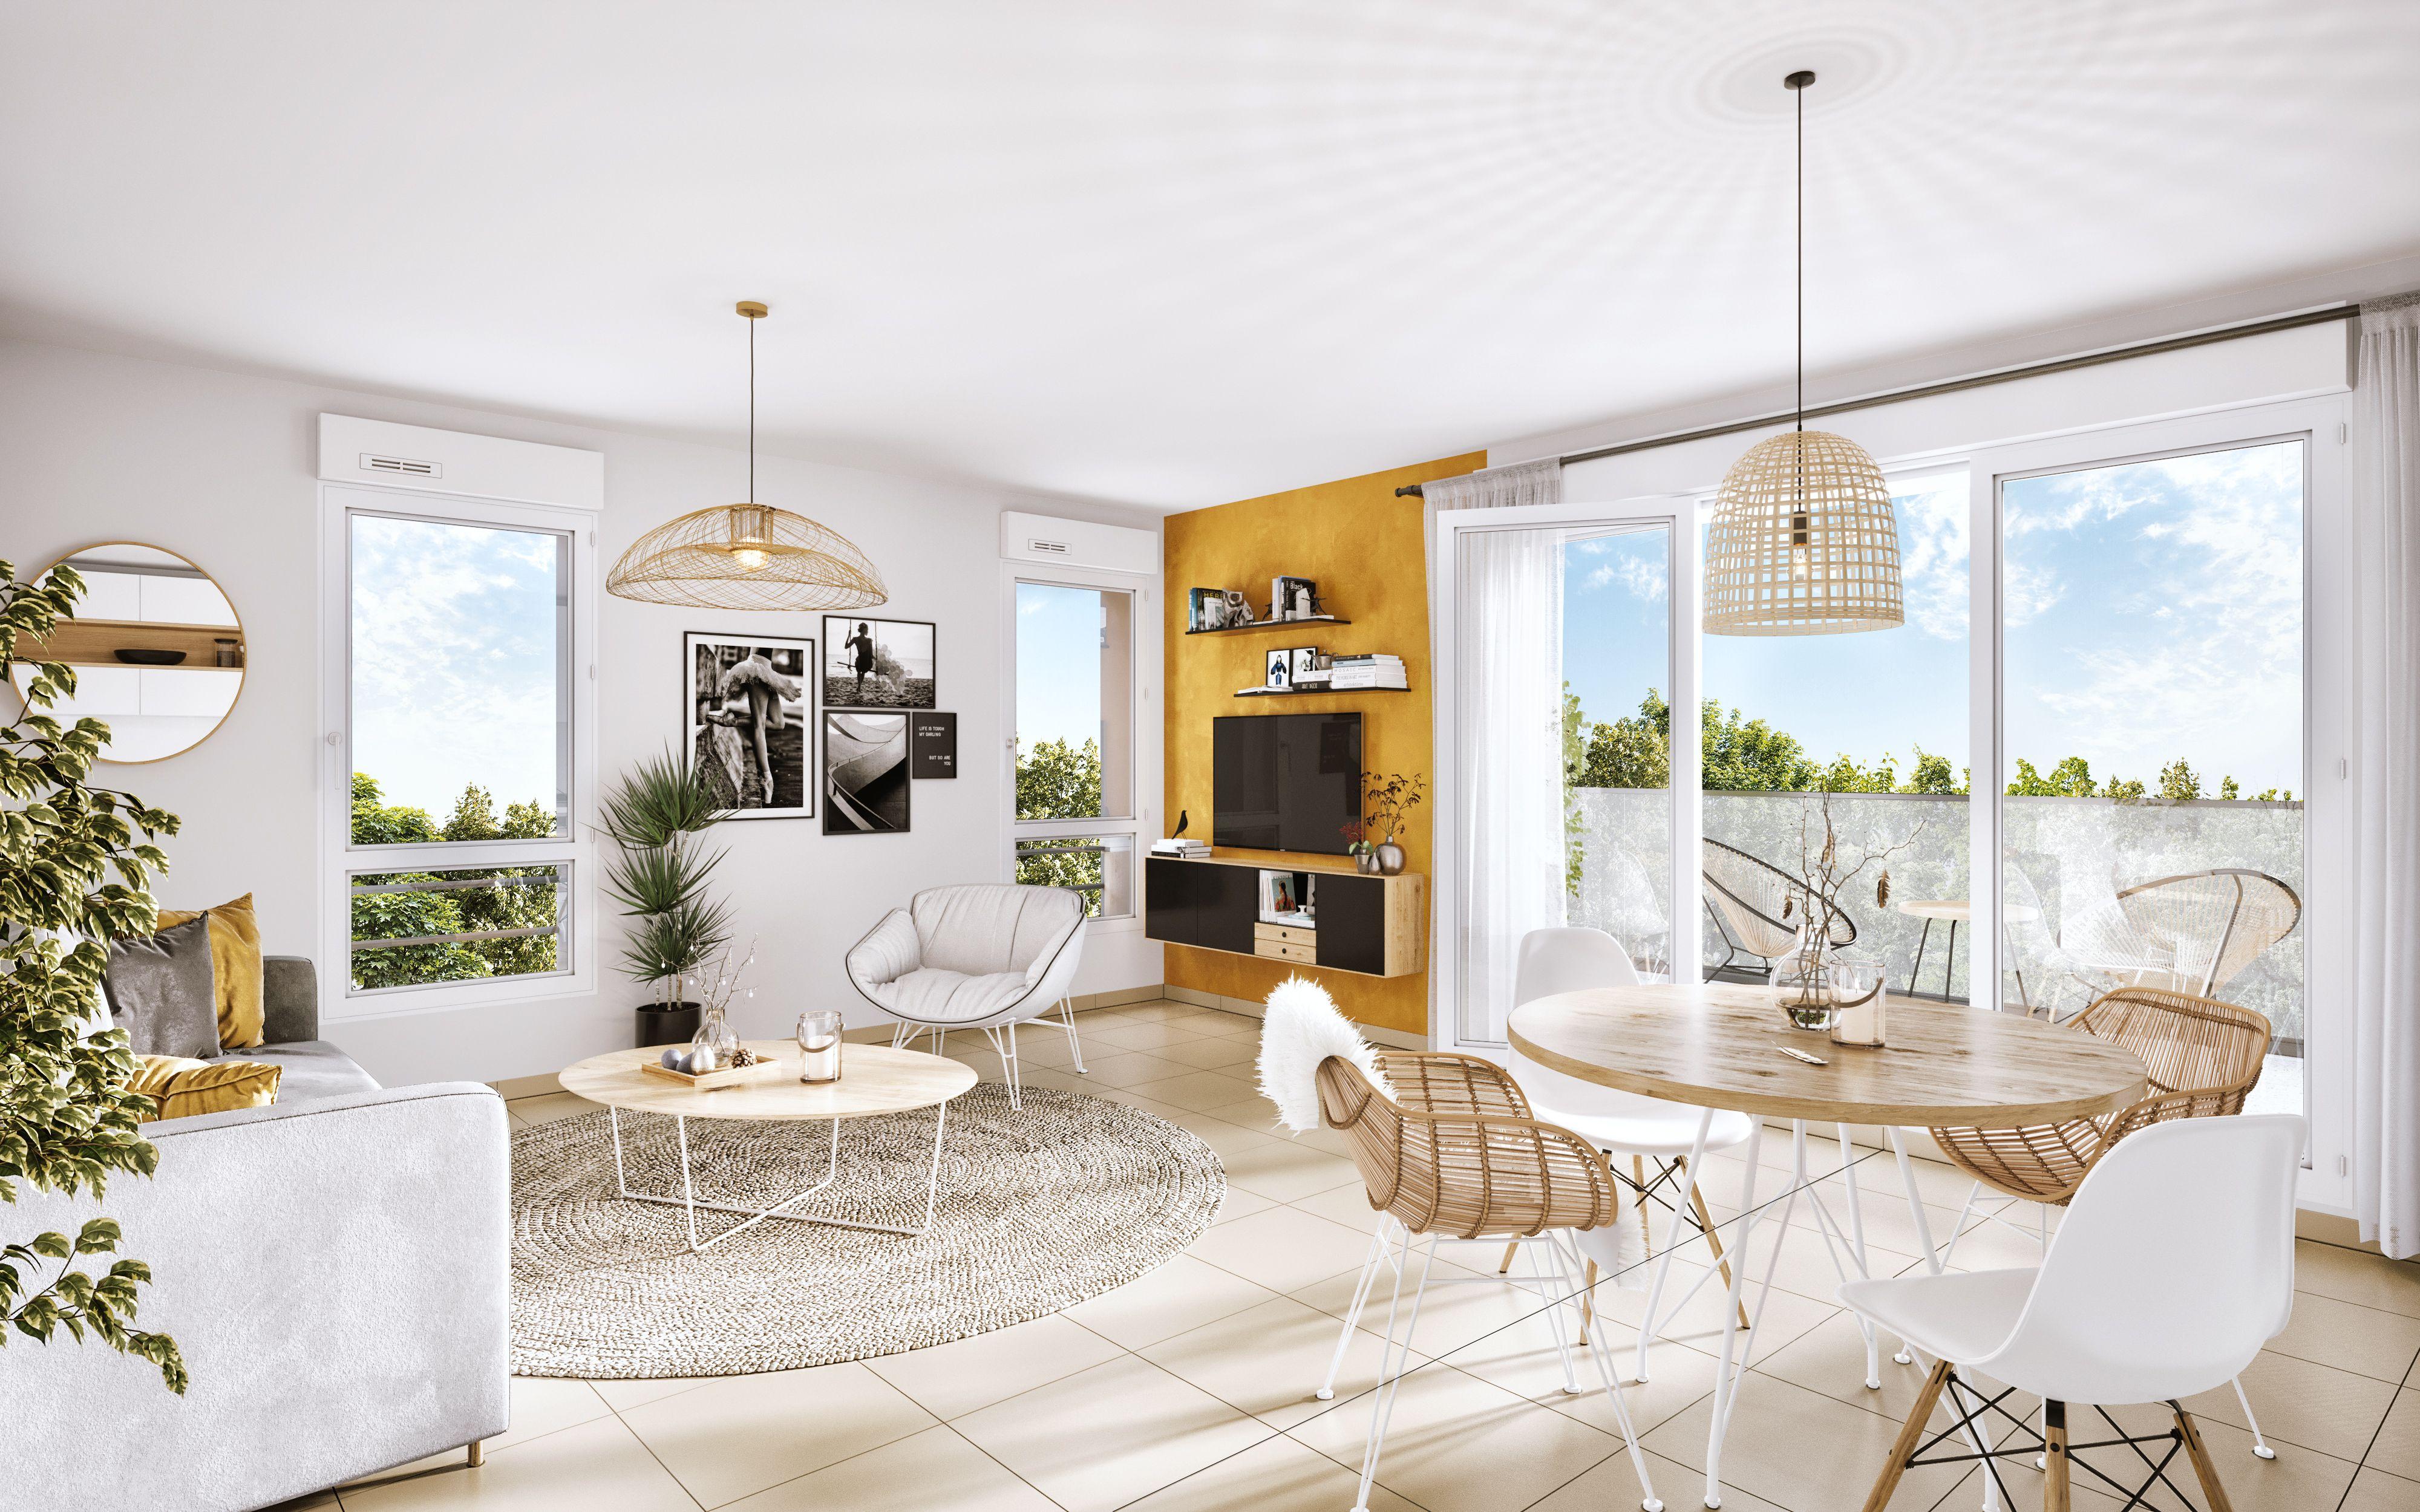 Côté Bon Accueil Immobilier Neuf Programme Immobilier Neuf Logement Neuf